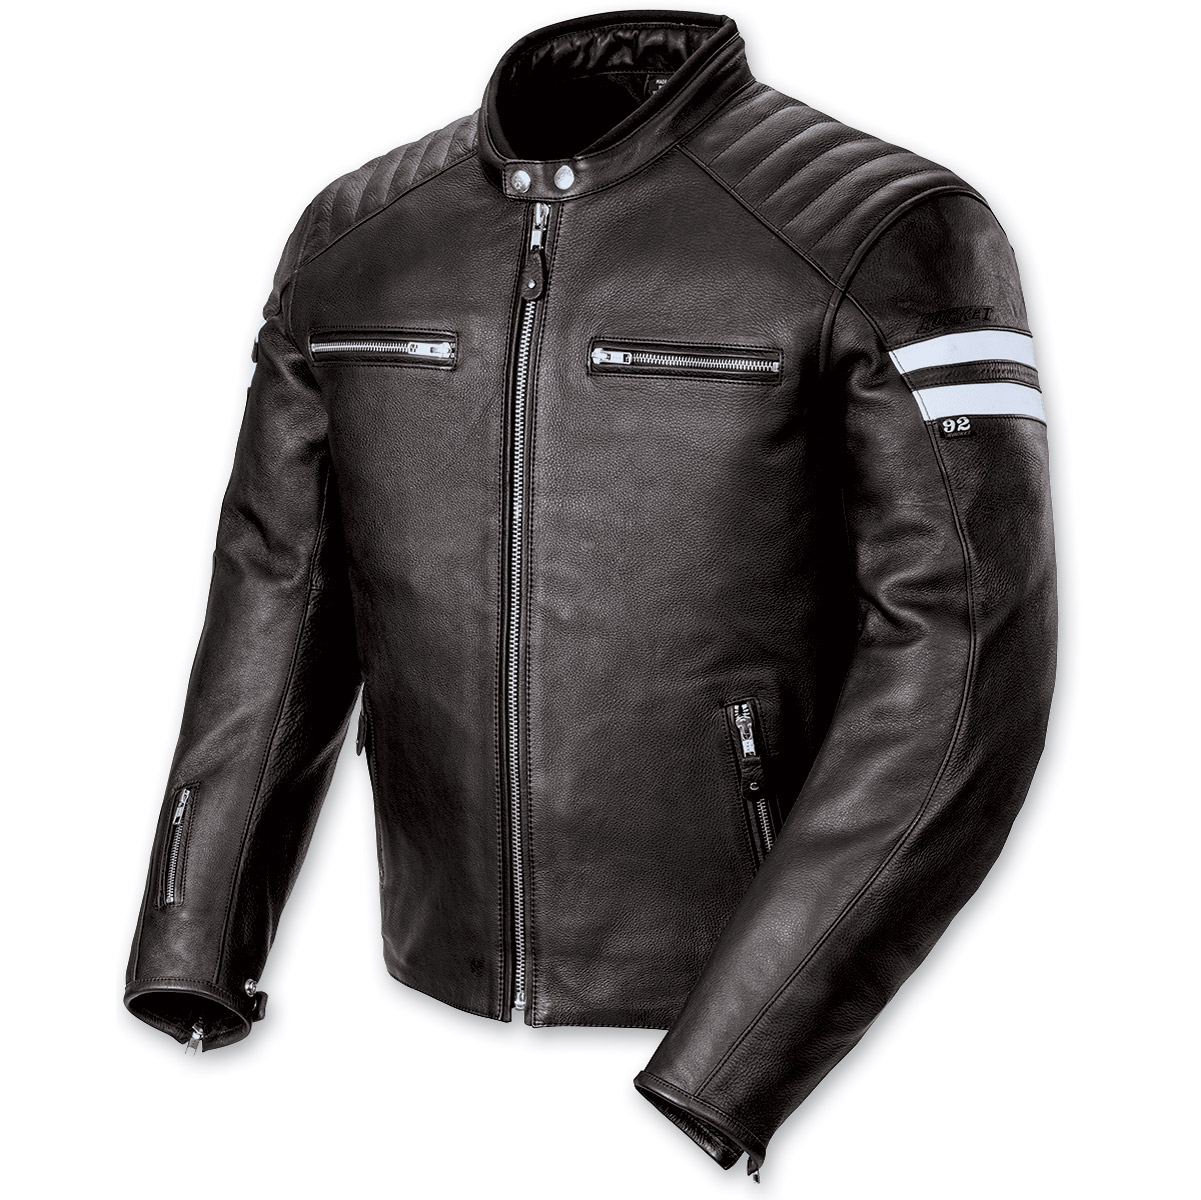 Joe Rocket Men′s Classic '92 Black and White Jacket